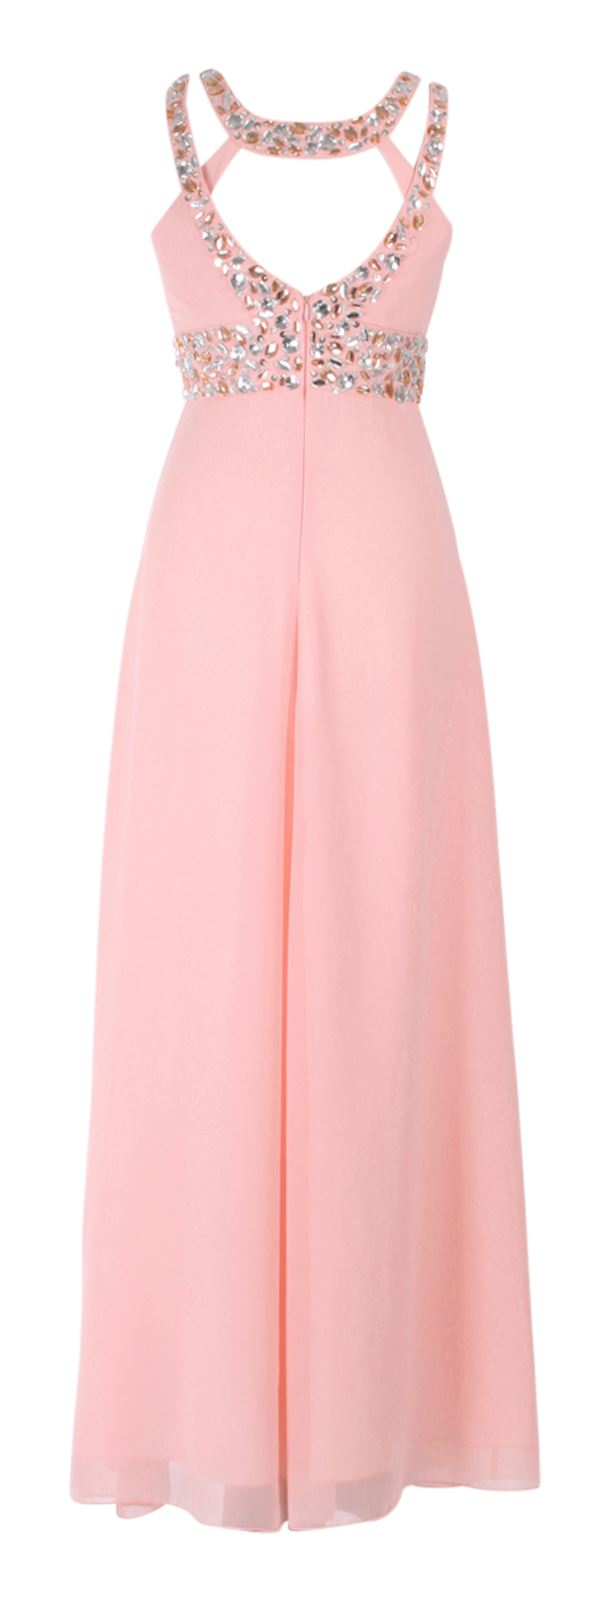 Ebay Prom Dresses Size 22 - Purple Graduation Dresses